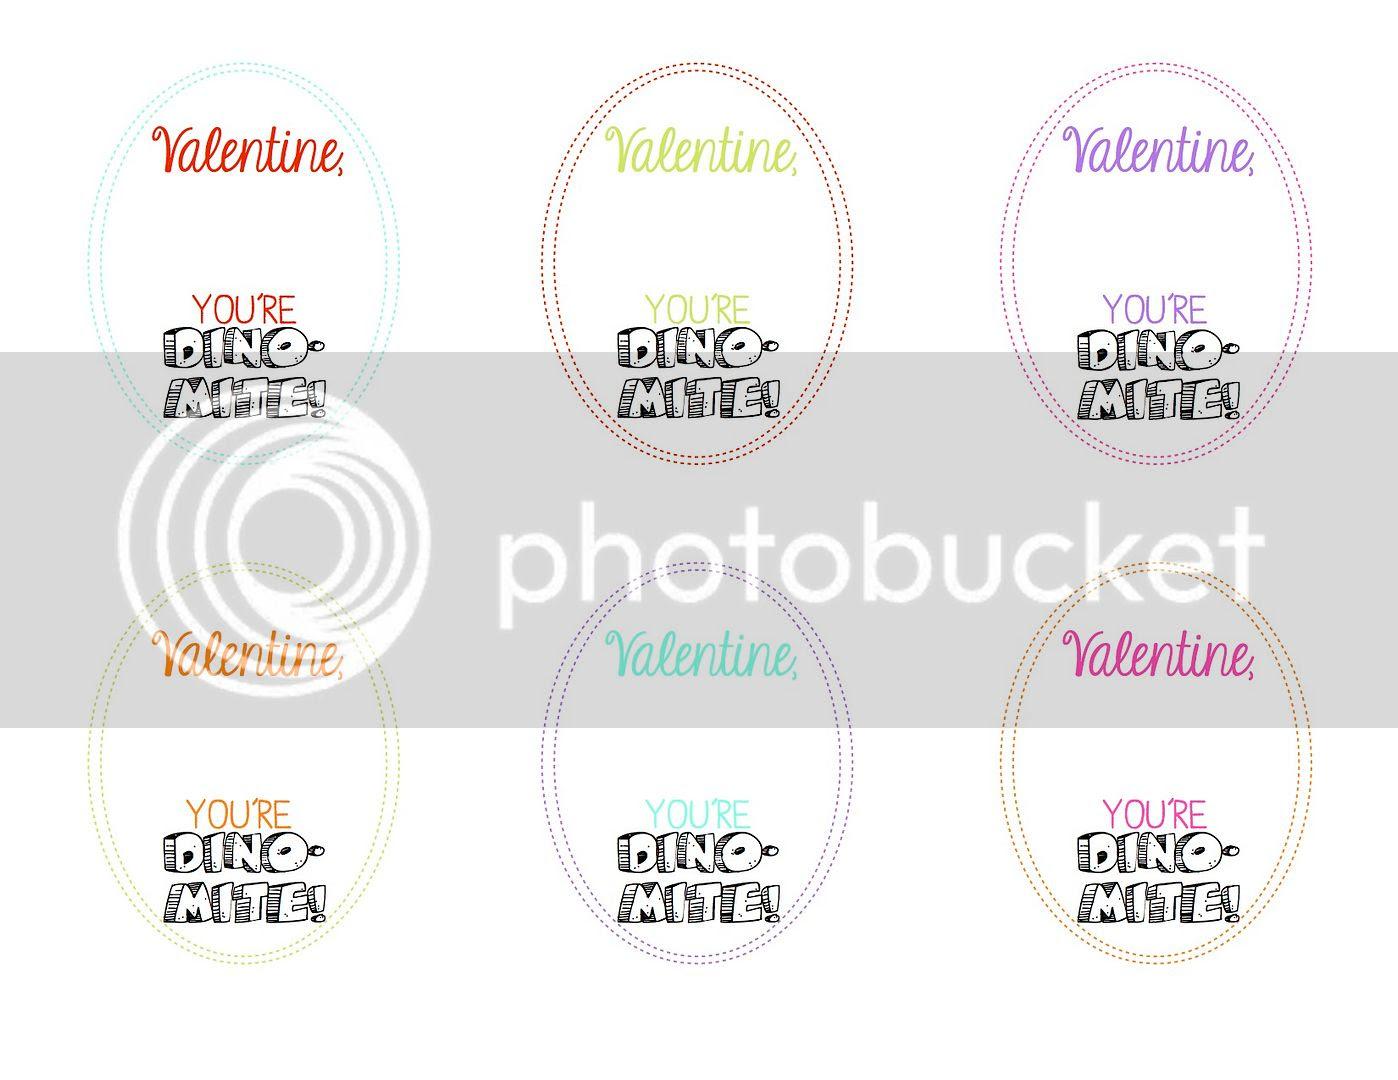 dino-mite valentines photo dinomite_zpsdd60950b.jpg